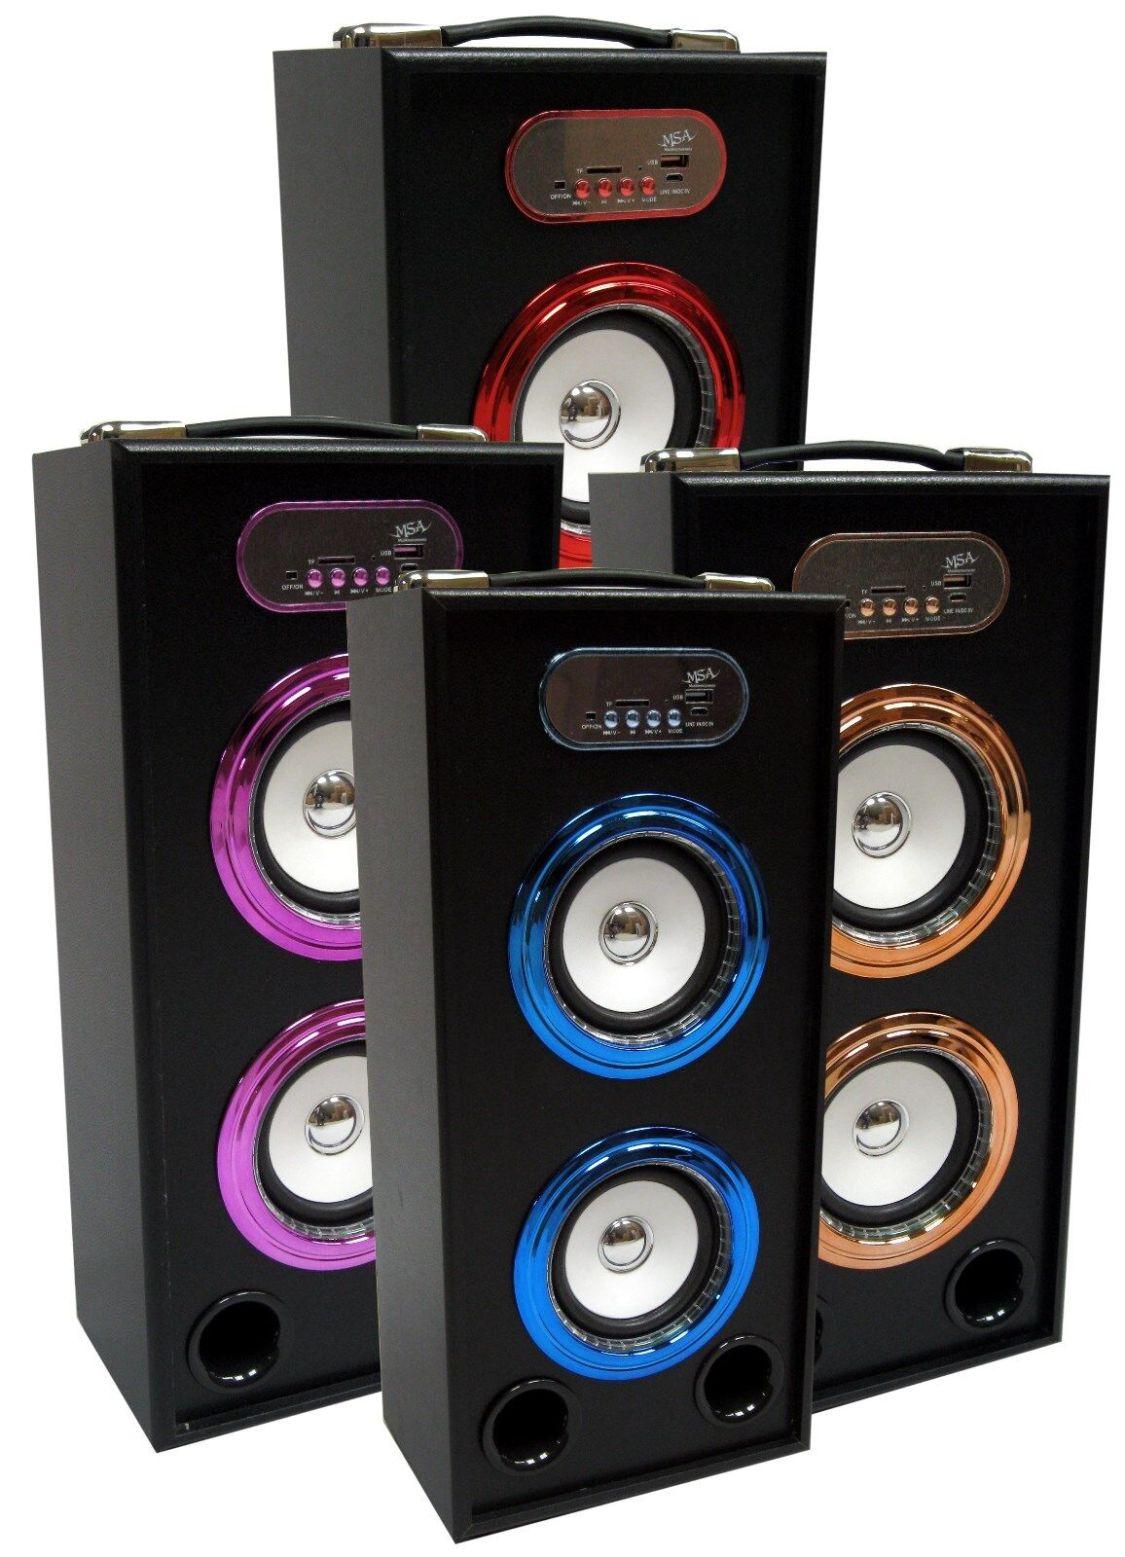 44cm TRAGBARE BLUETOOTH LAUTSPRECHER - VERS. FARBEN - SOUNDBOX - FM,AUX,SD,MP3